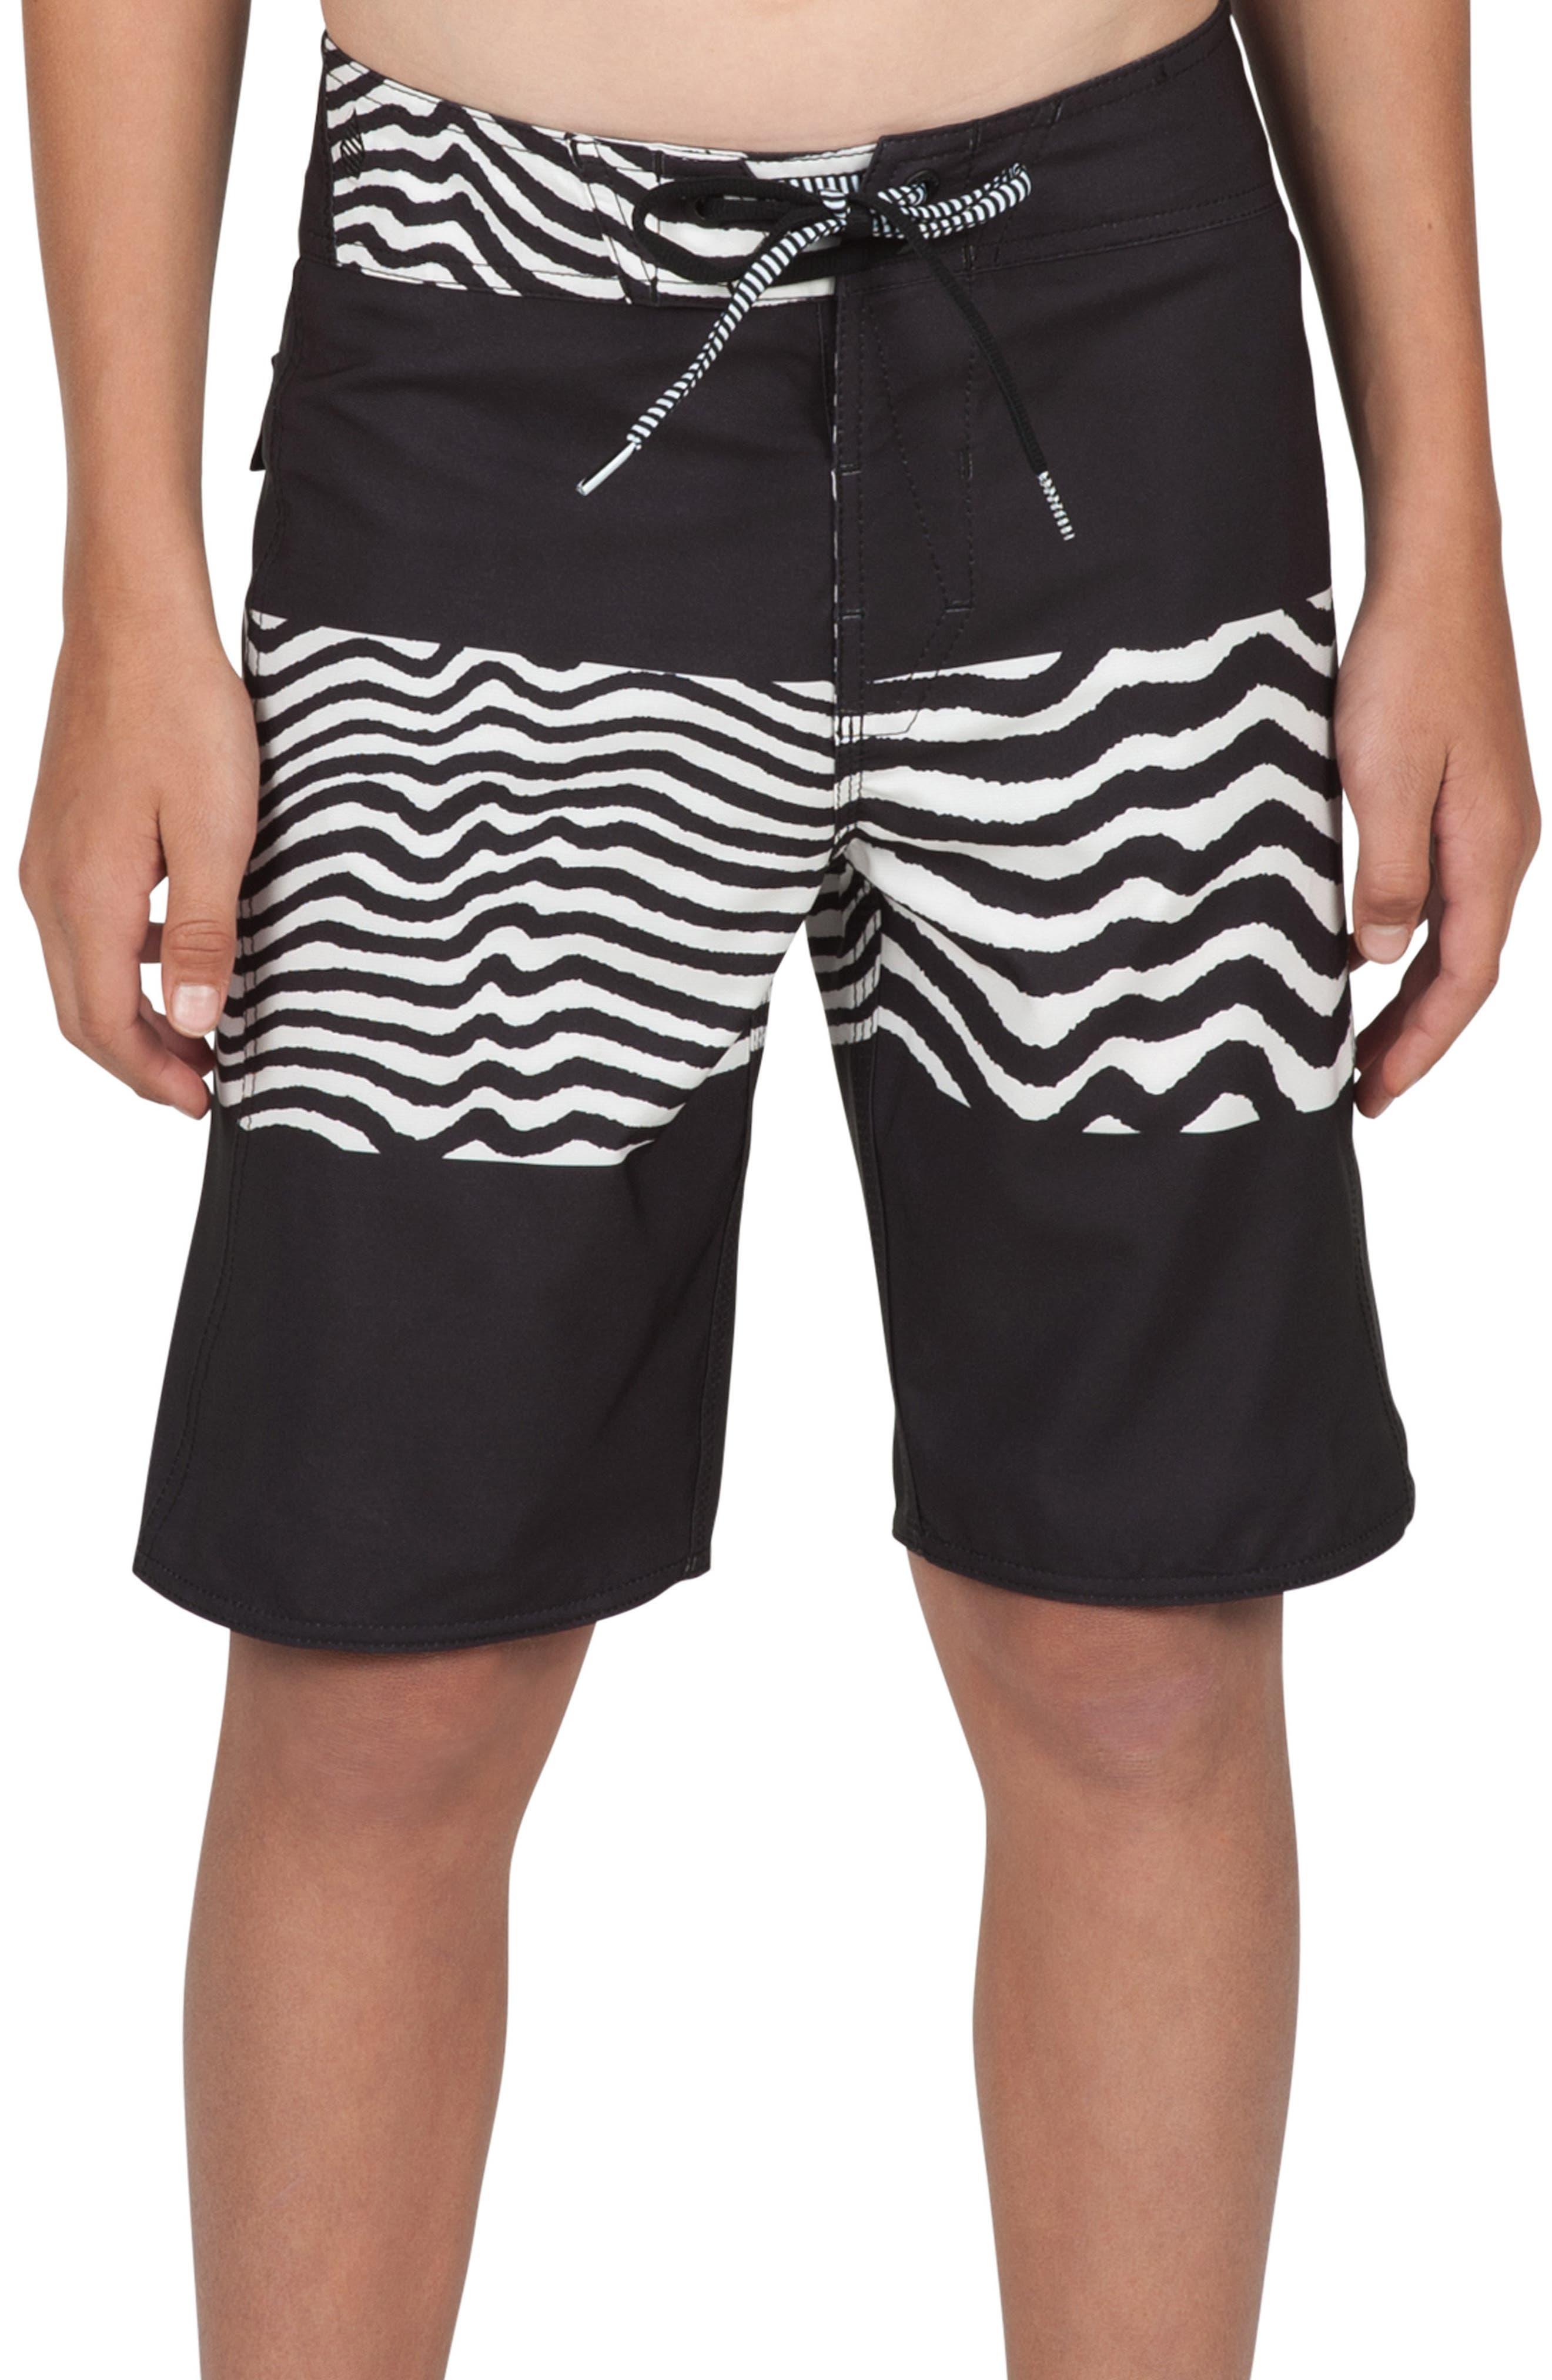 Macaw Mod Board Shorts,                         Main,                         color, 001